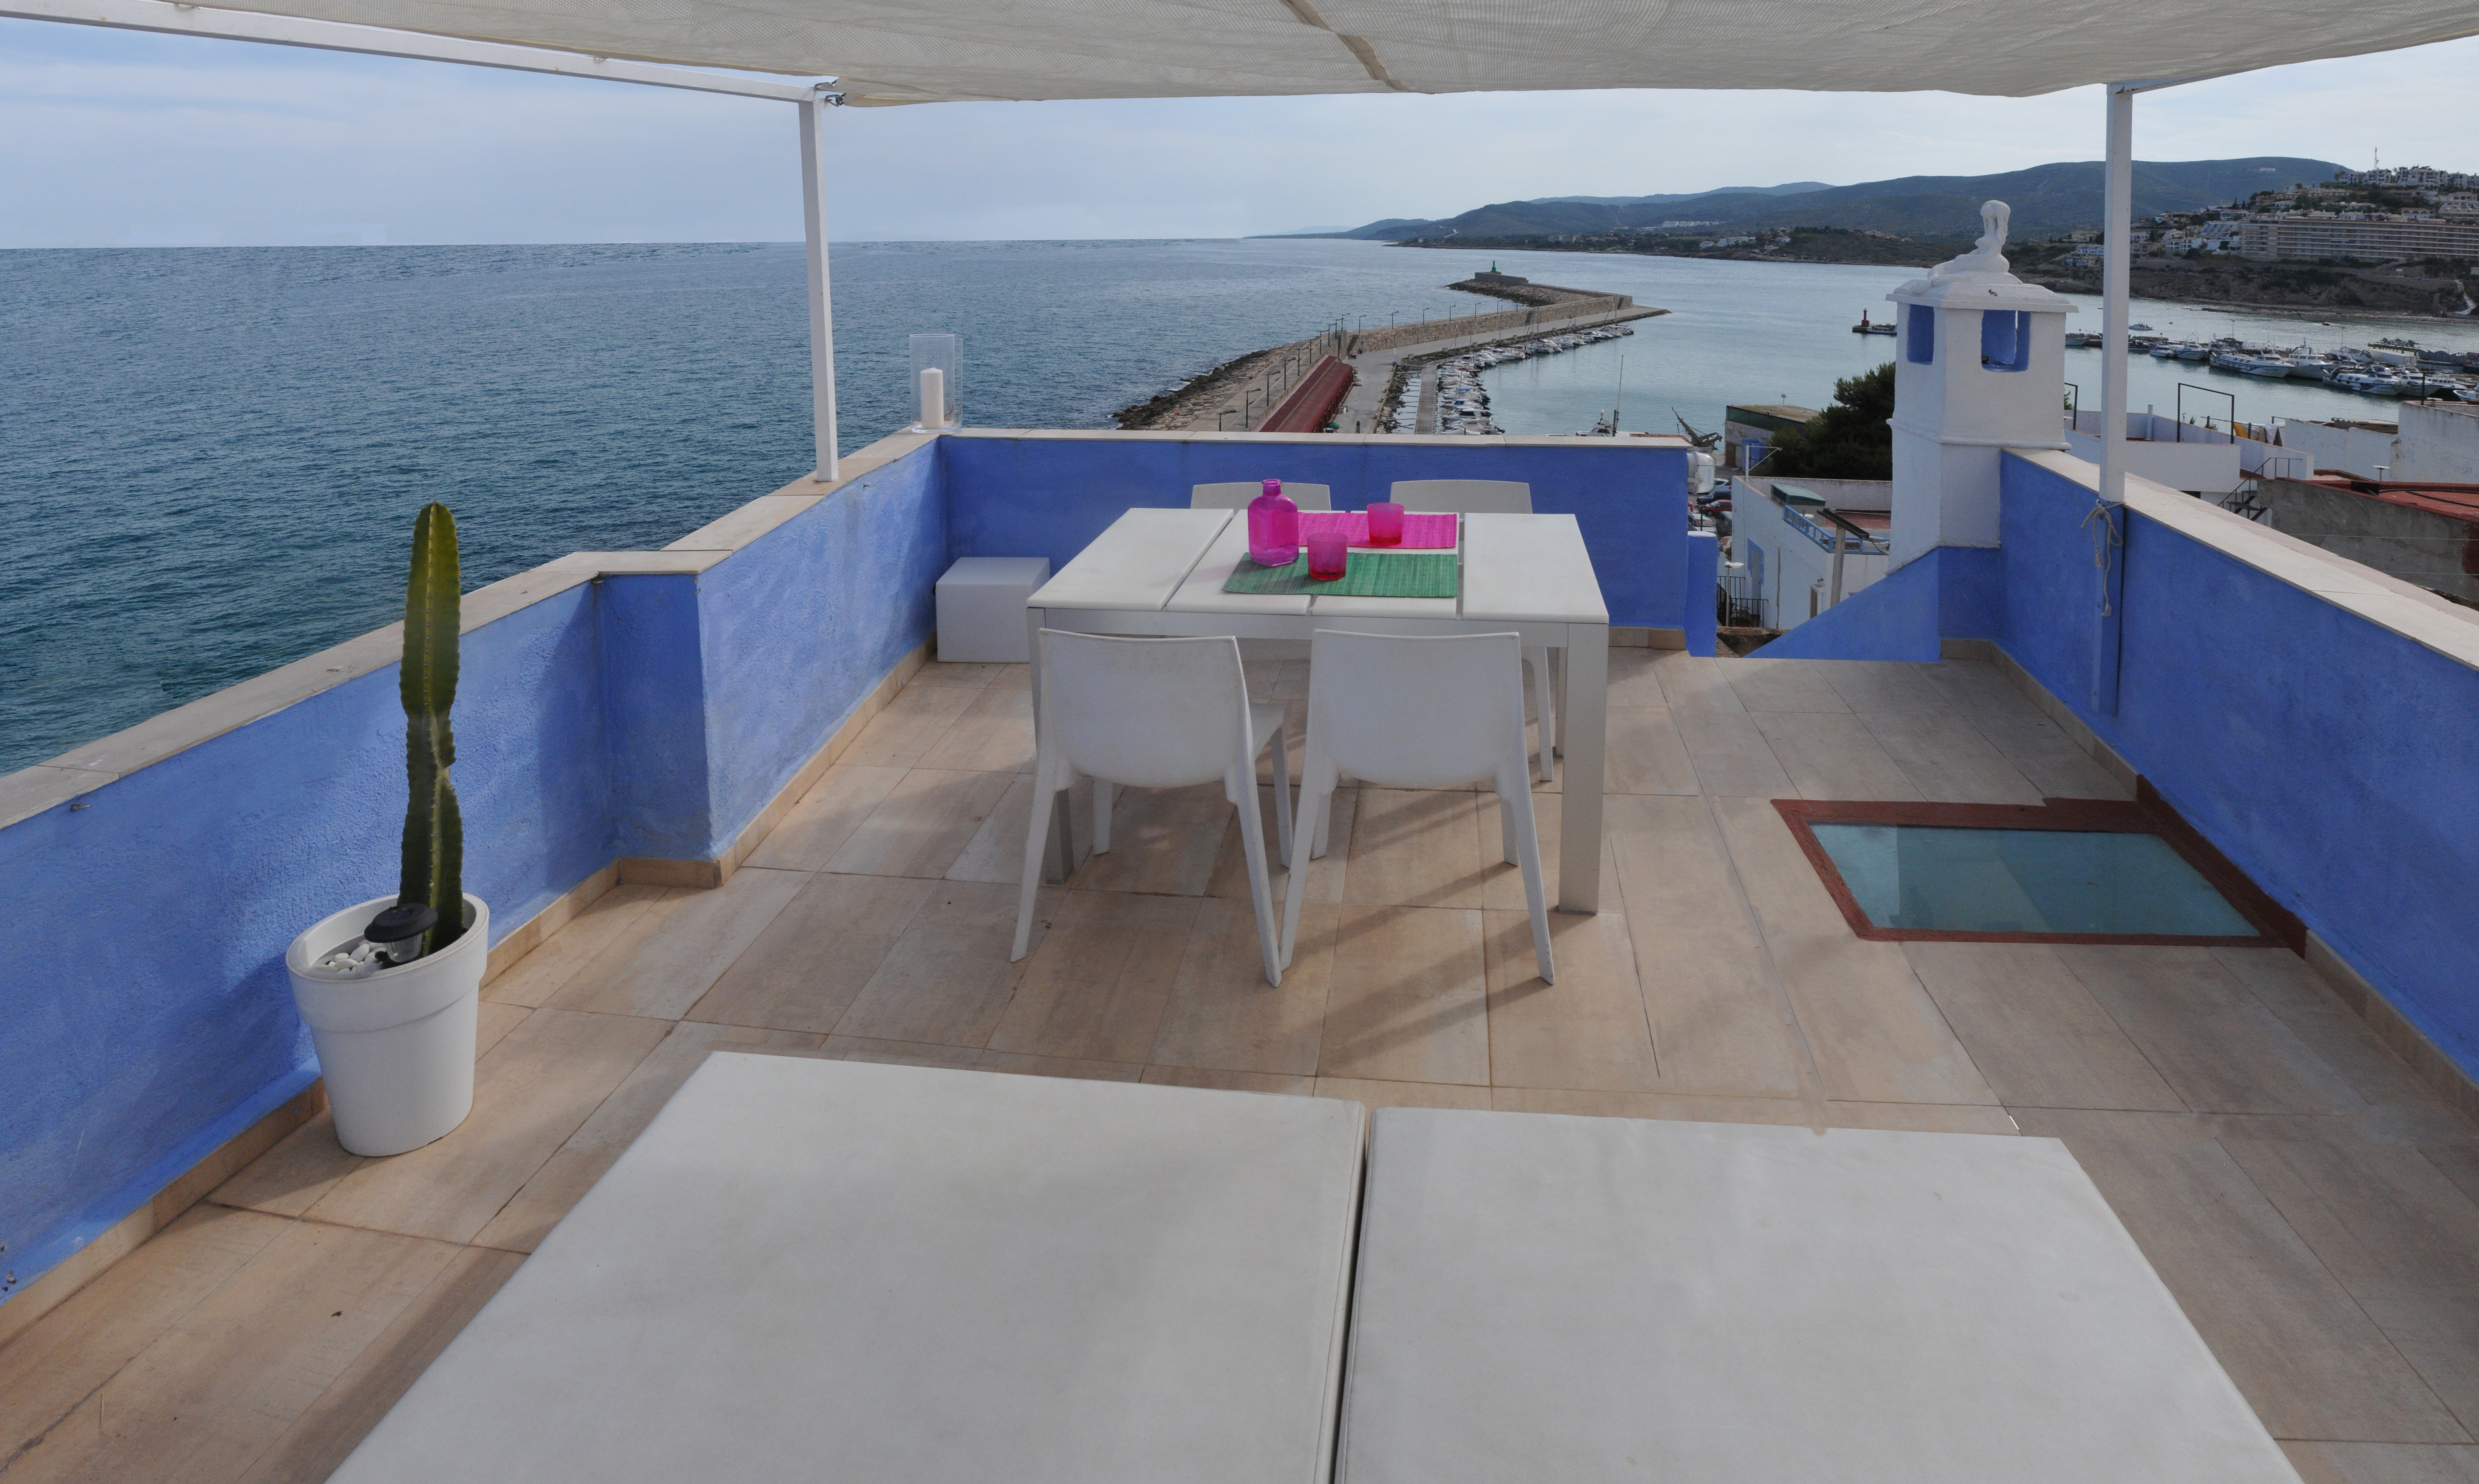 terraza 2016 sdddd